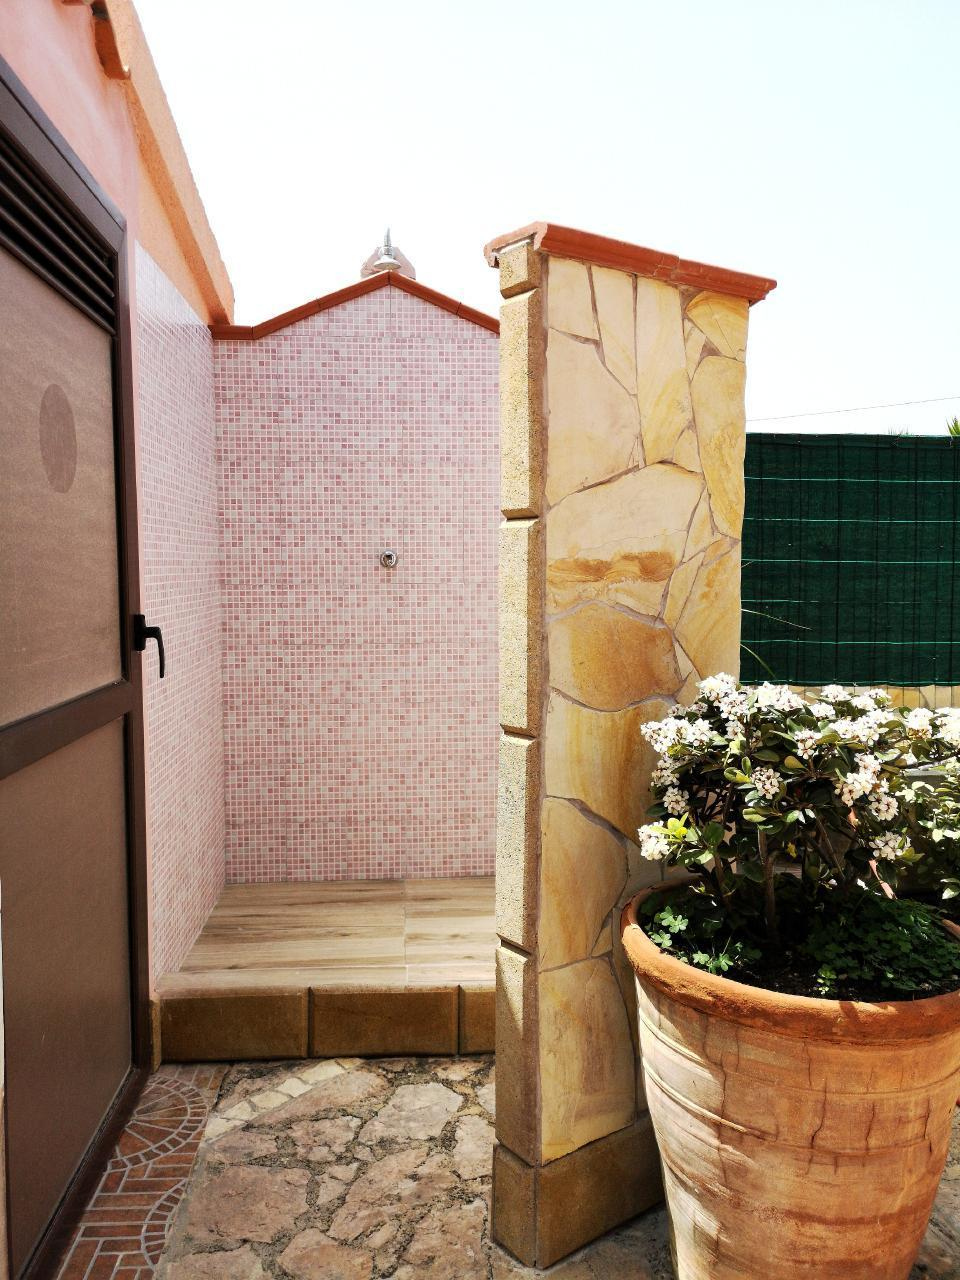 Maison de vacances Costa Mediterranea Ferienhaus (2144931), Cefalù, Palermo, Sicile, Italie, image 26